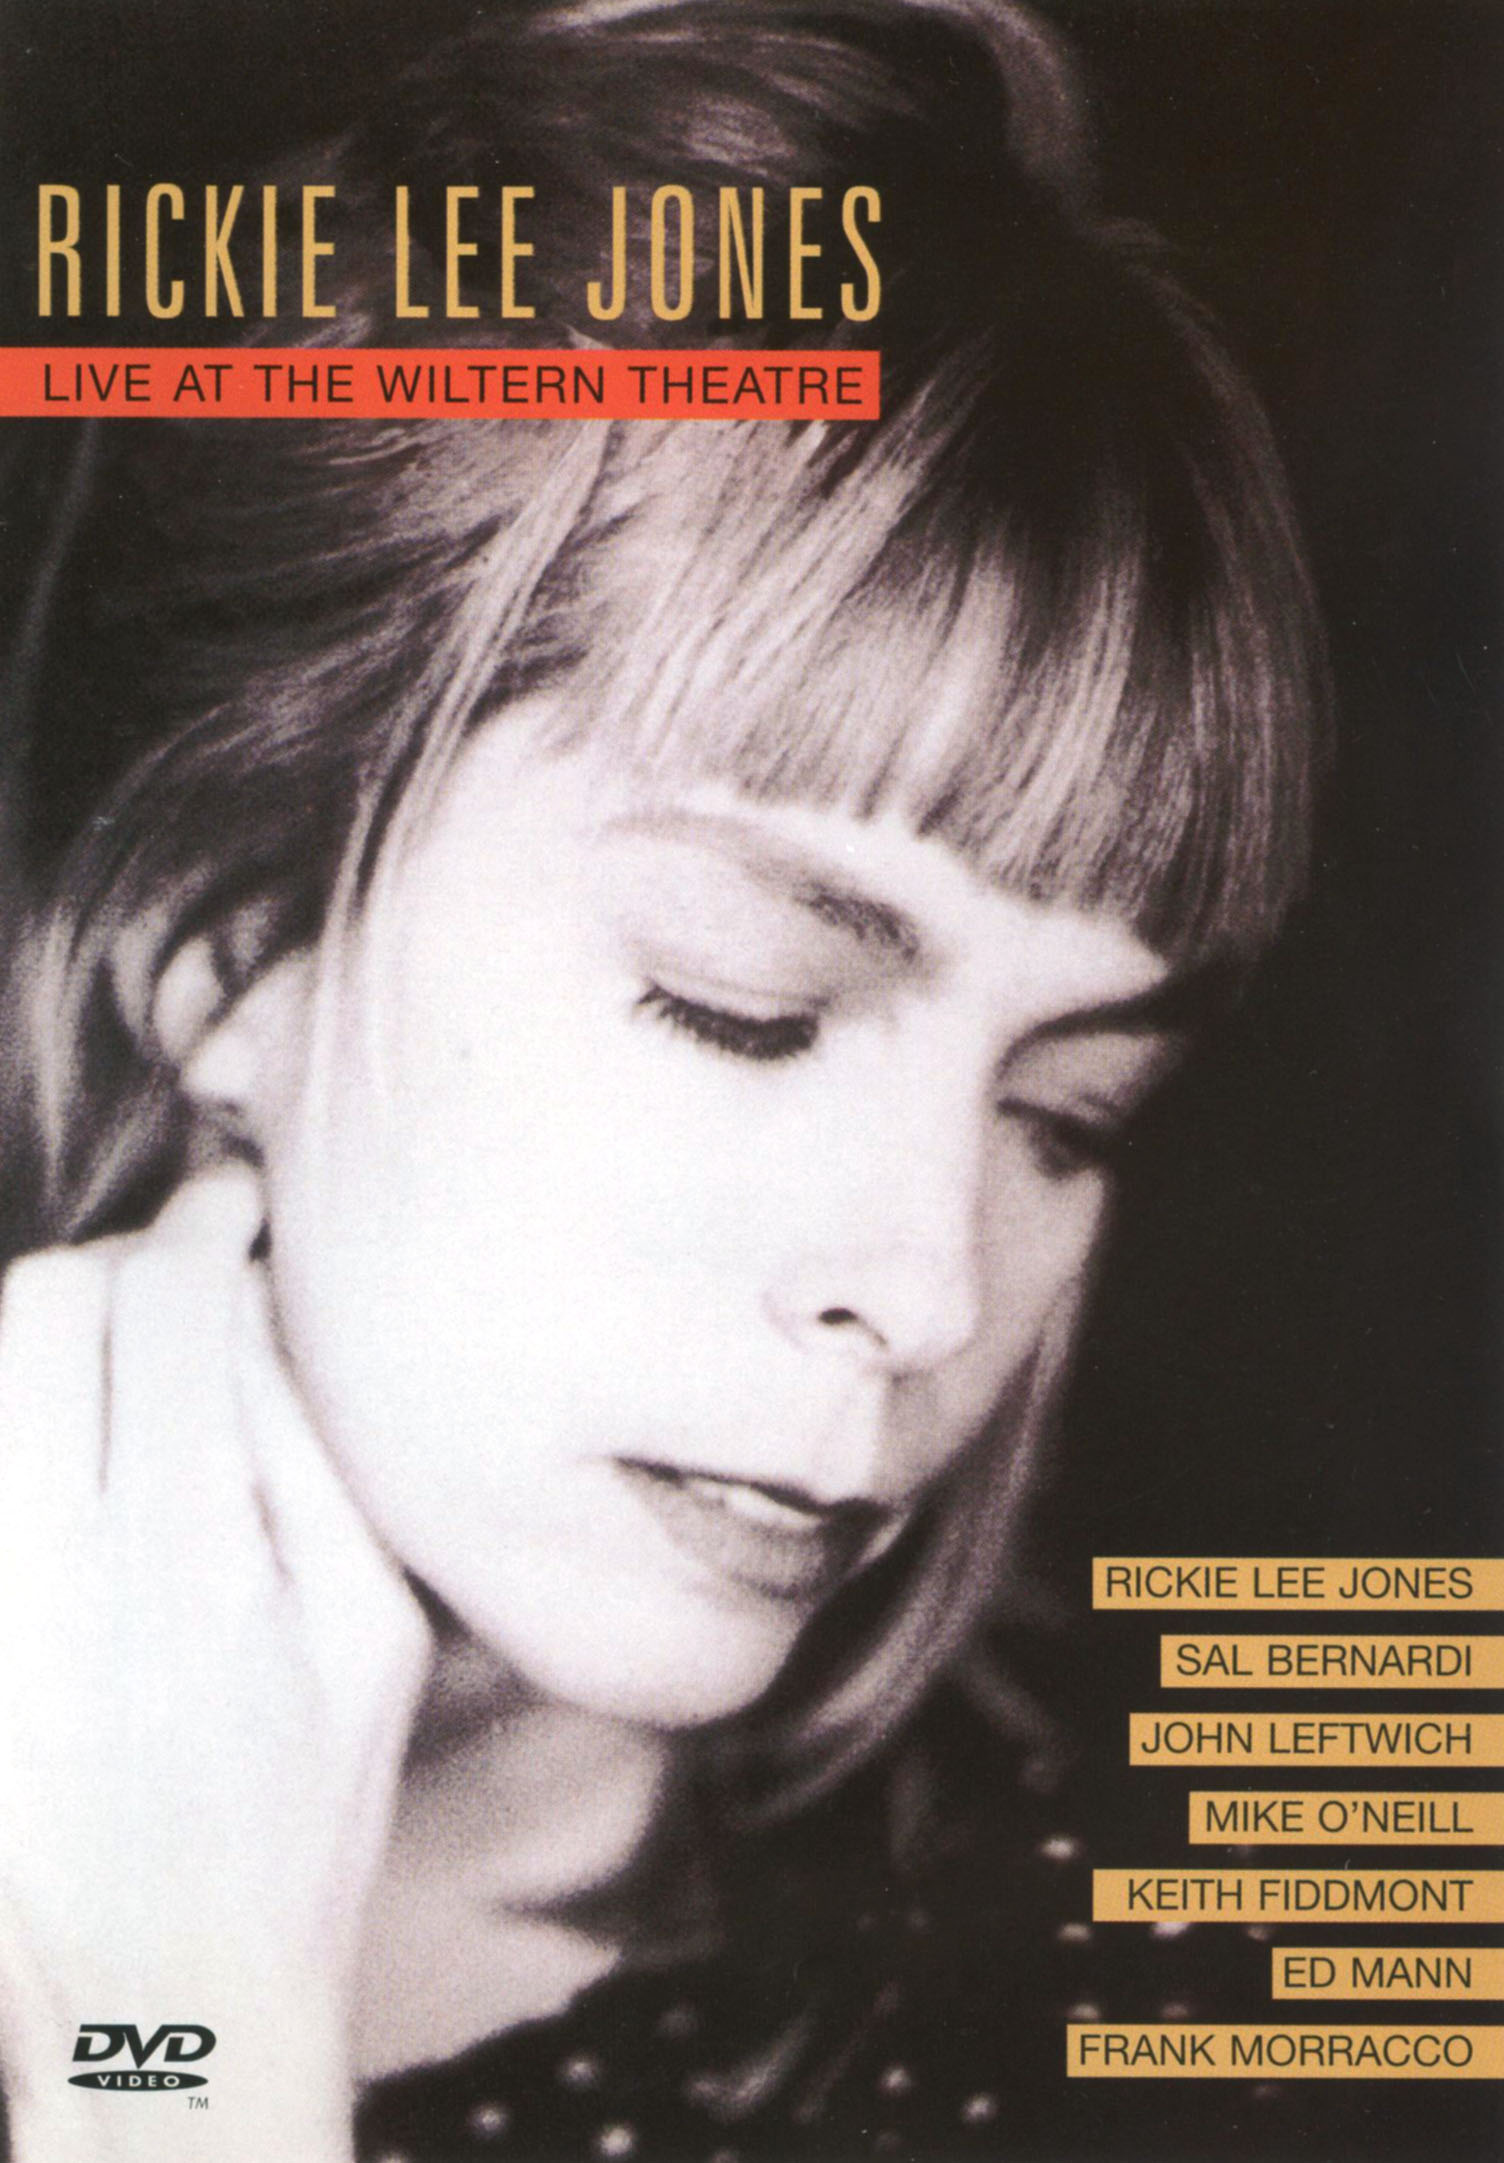 Rickie Lee Jones: Live at the Wiltern Theatre